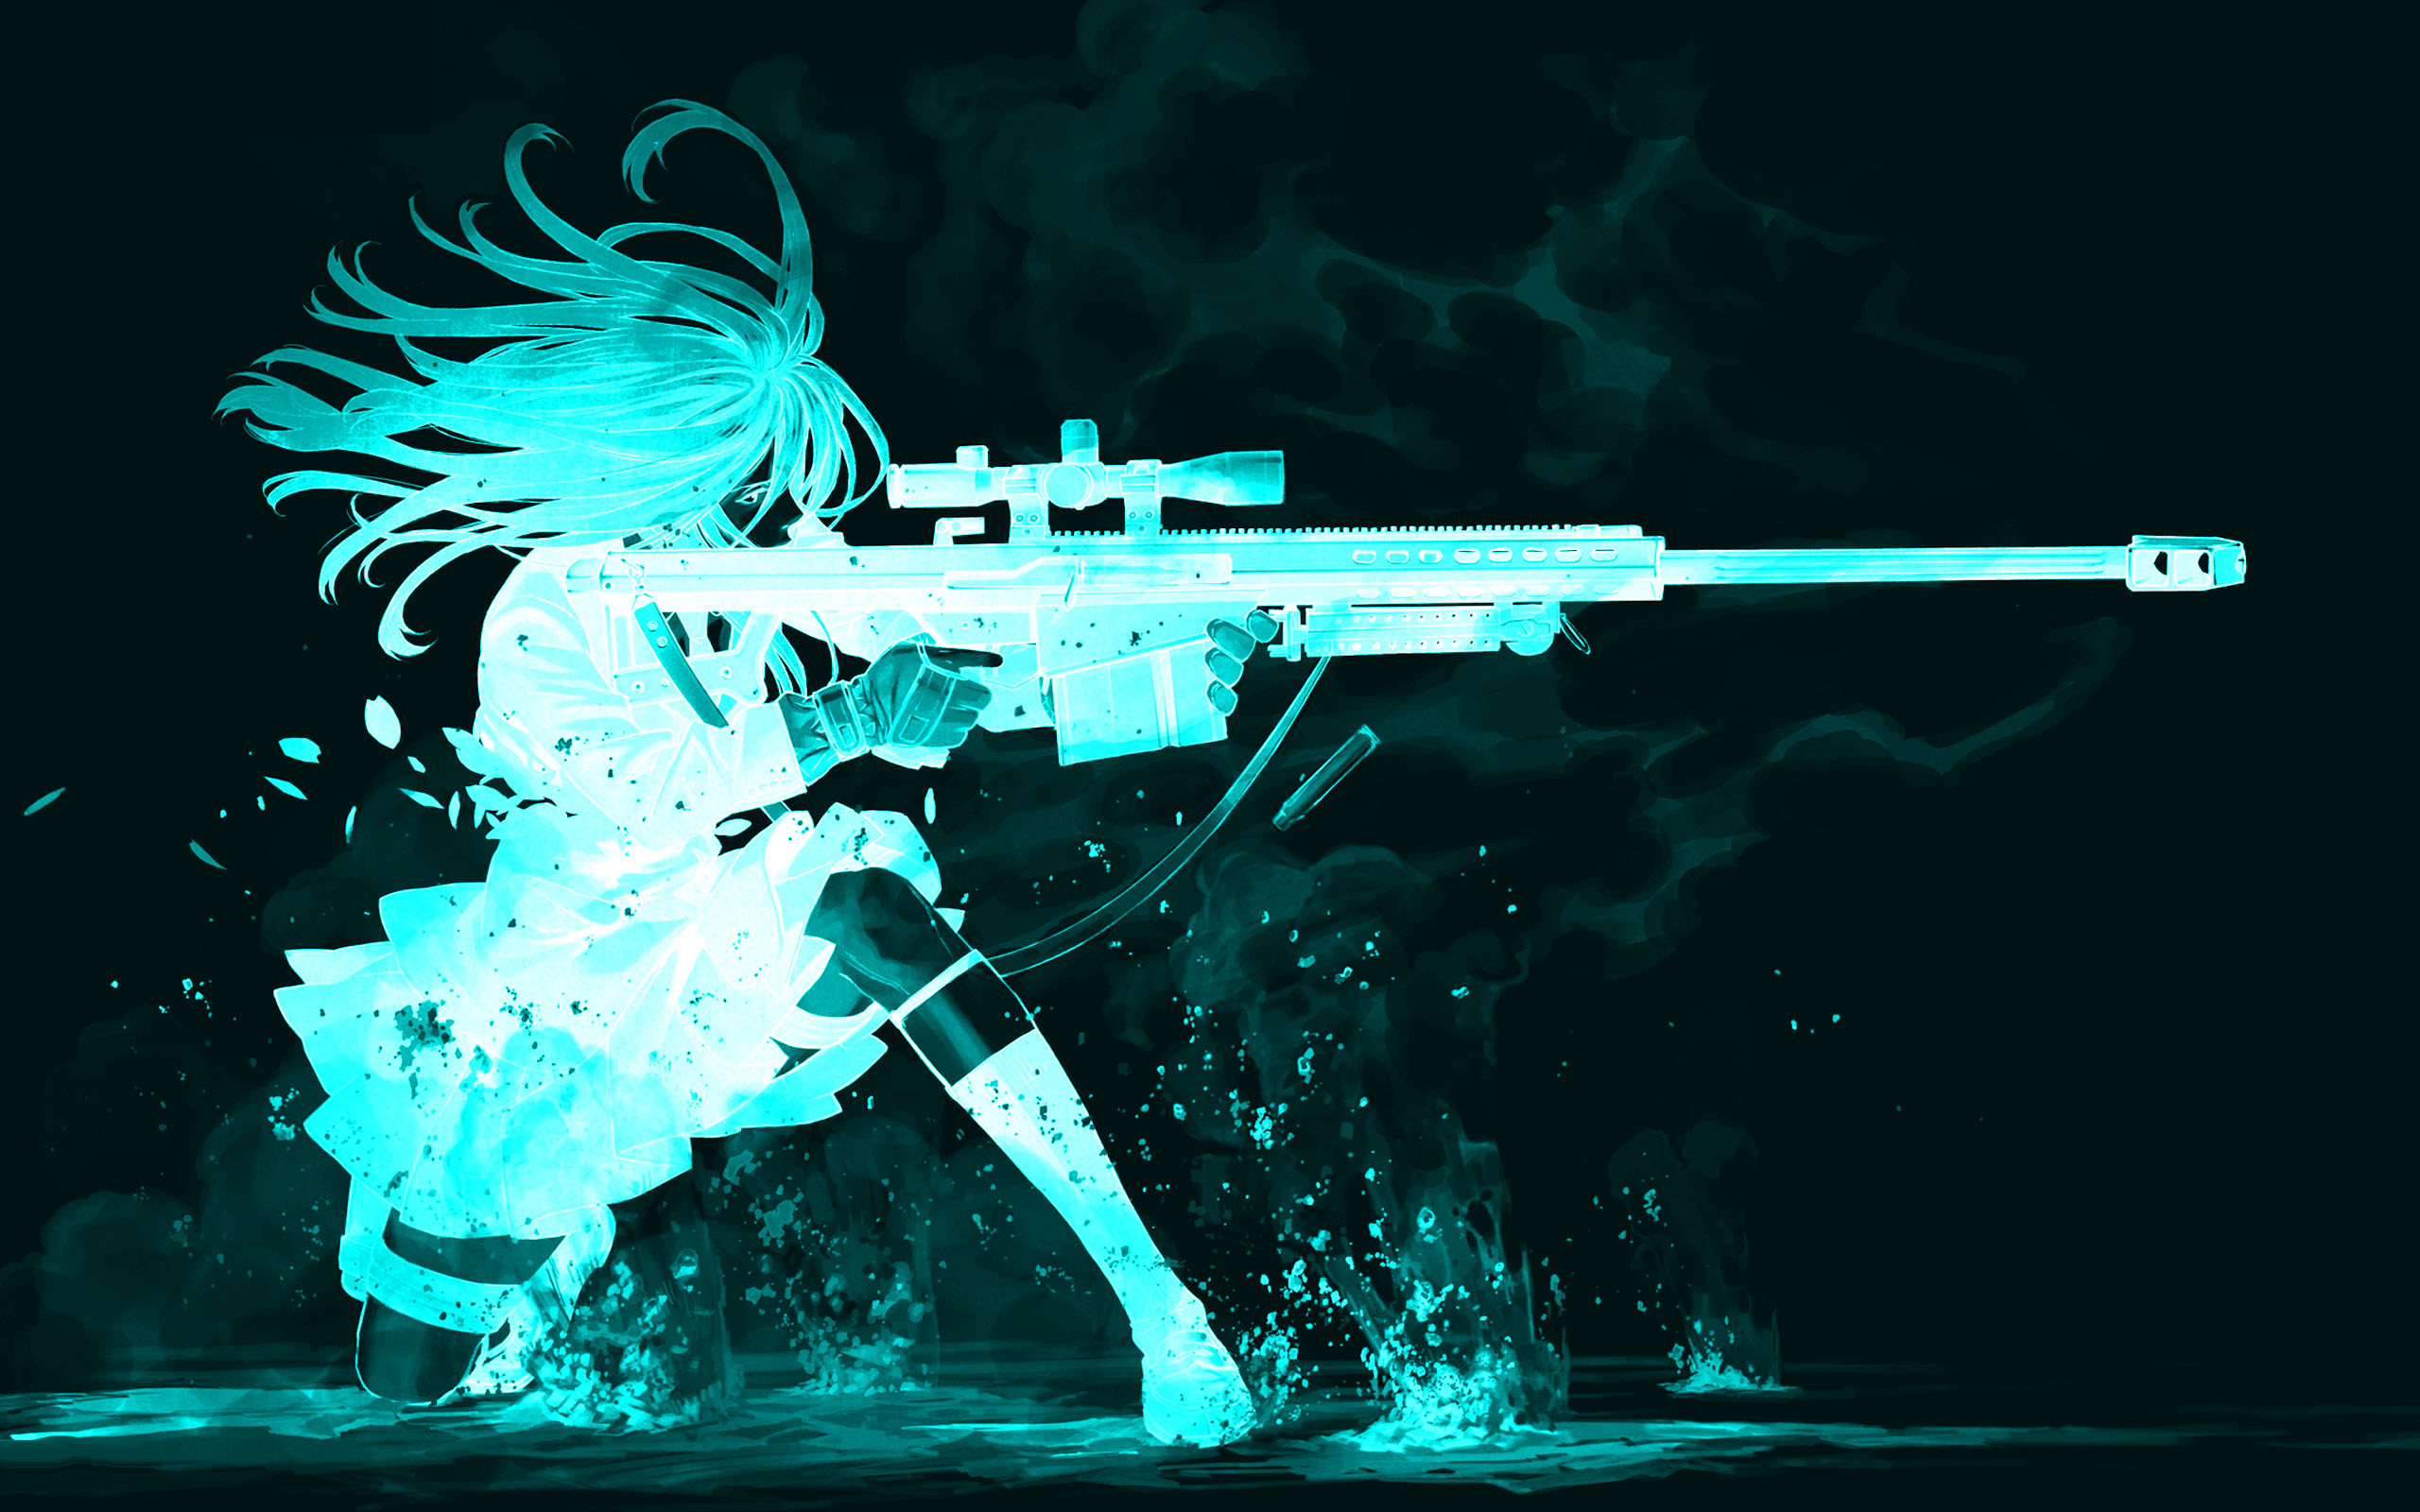 Gun Girl Computer Wallpapers, Desktop Backgrounds | | ID .